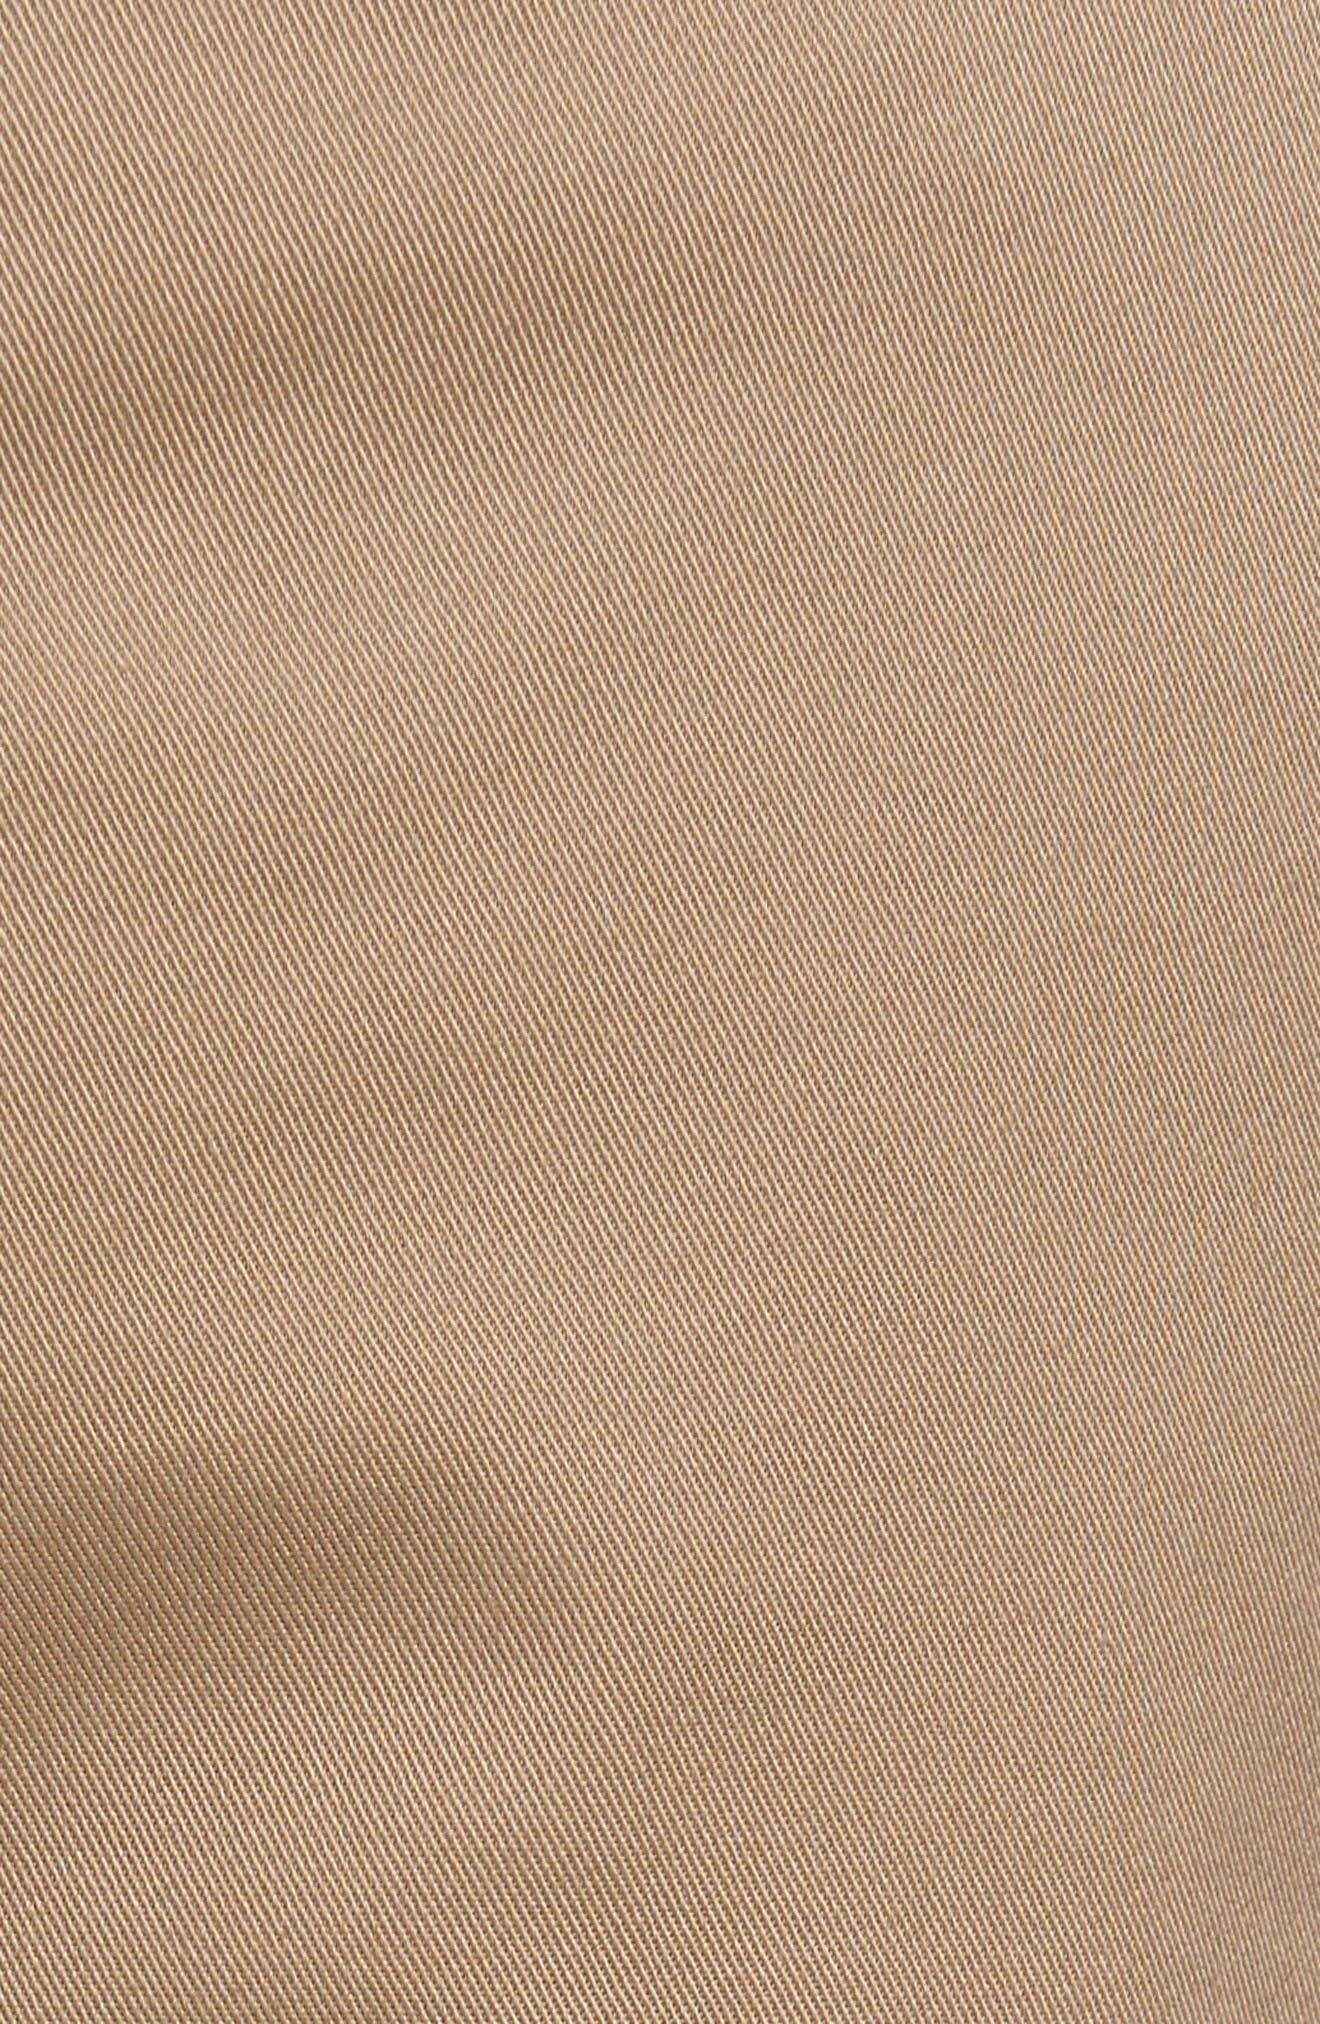 The Week-End Stretch Twill Chino Shorts,                             Alternate thumbnail 5, color,                             Dark Khaki